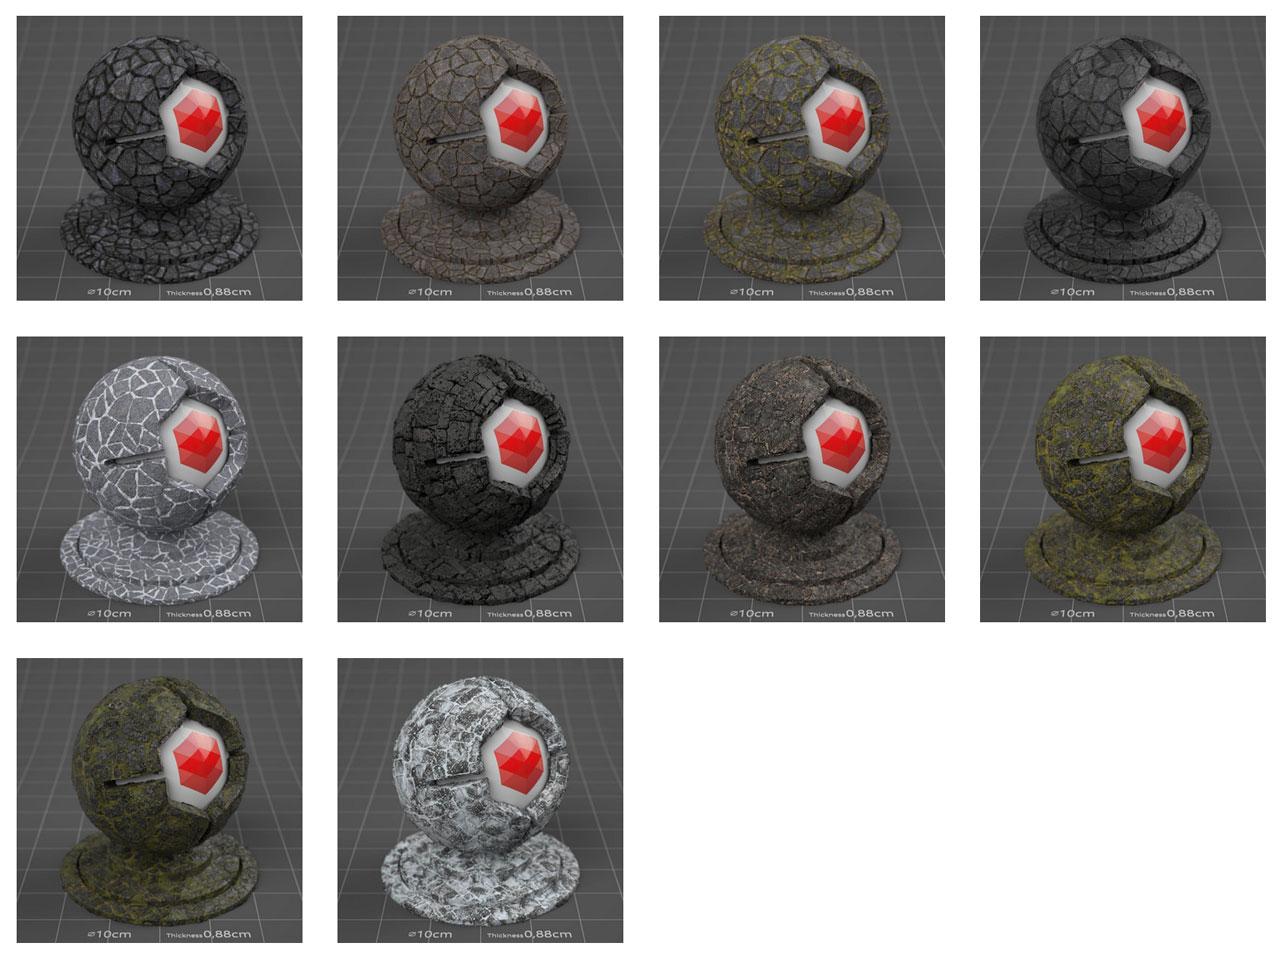 pixel lab redshift mutating stones wall lavastone